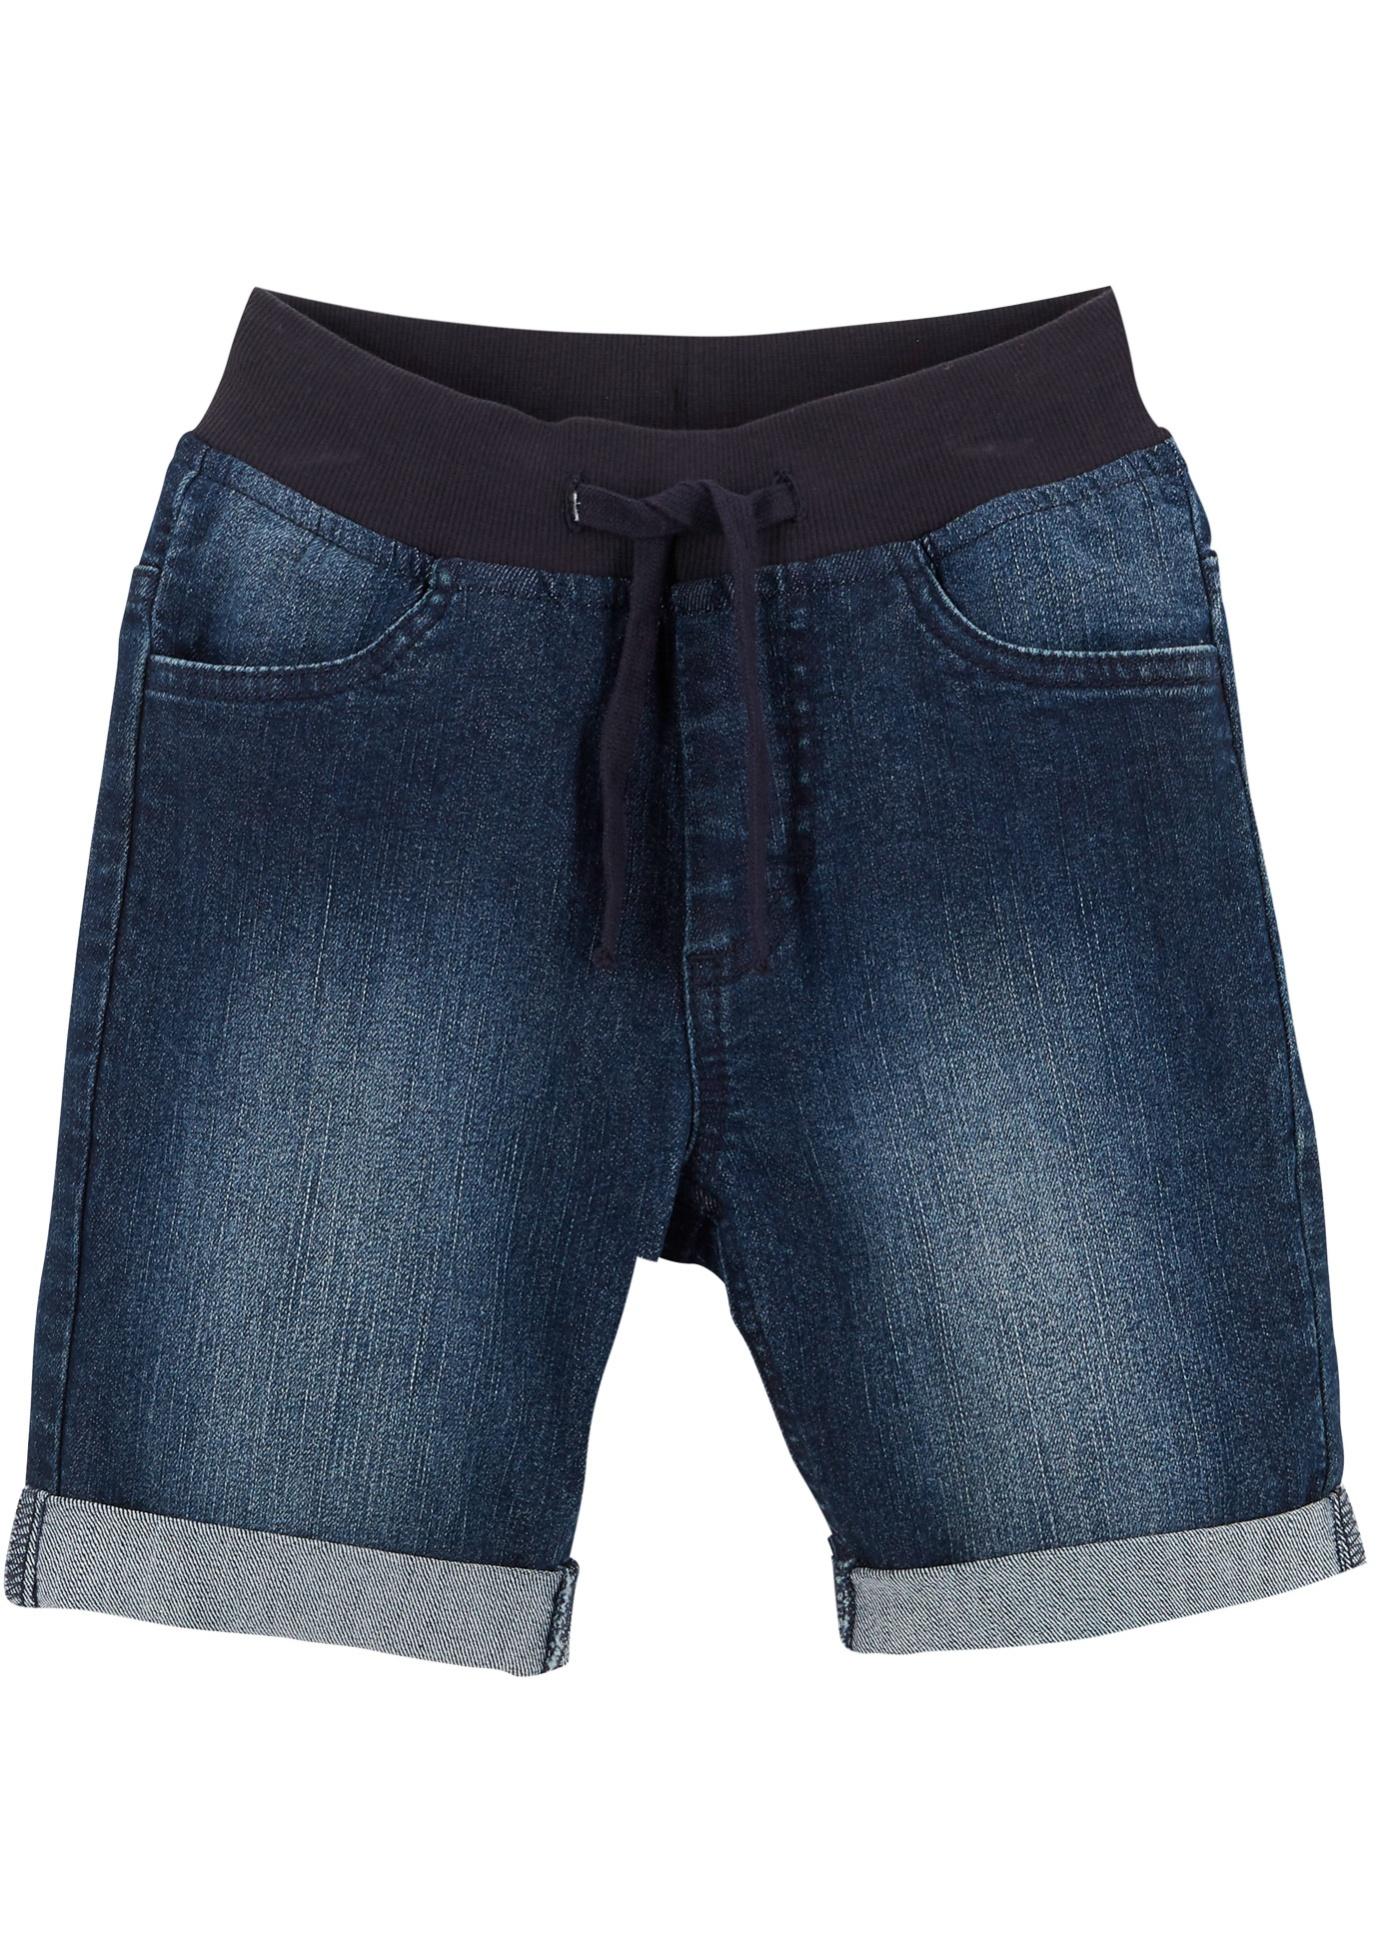 Bermuda di jeans (Nero) - John Baner JEANSWEAR